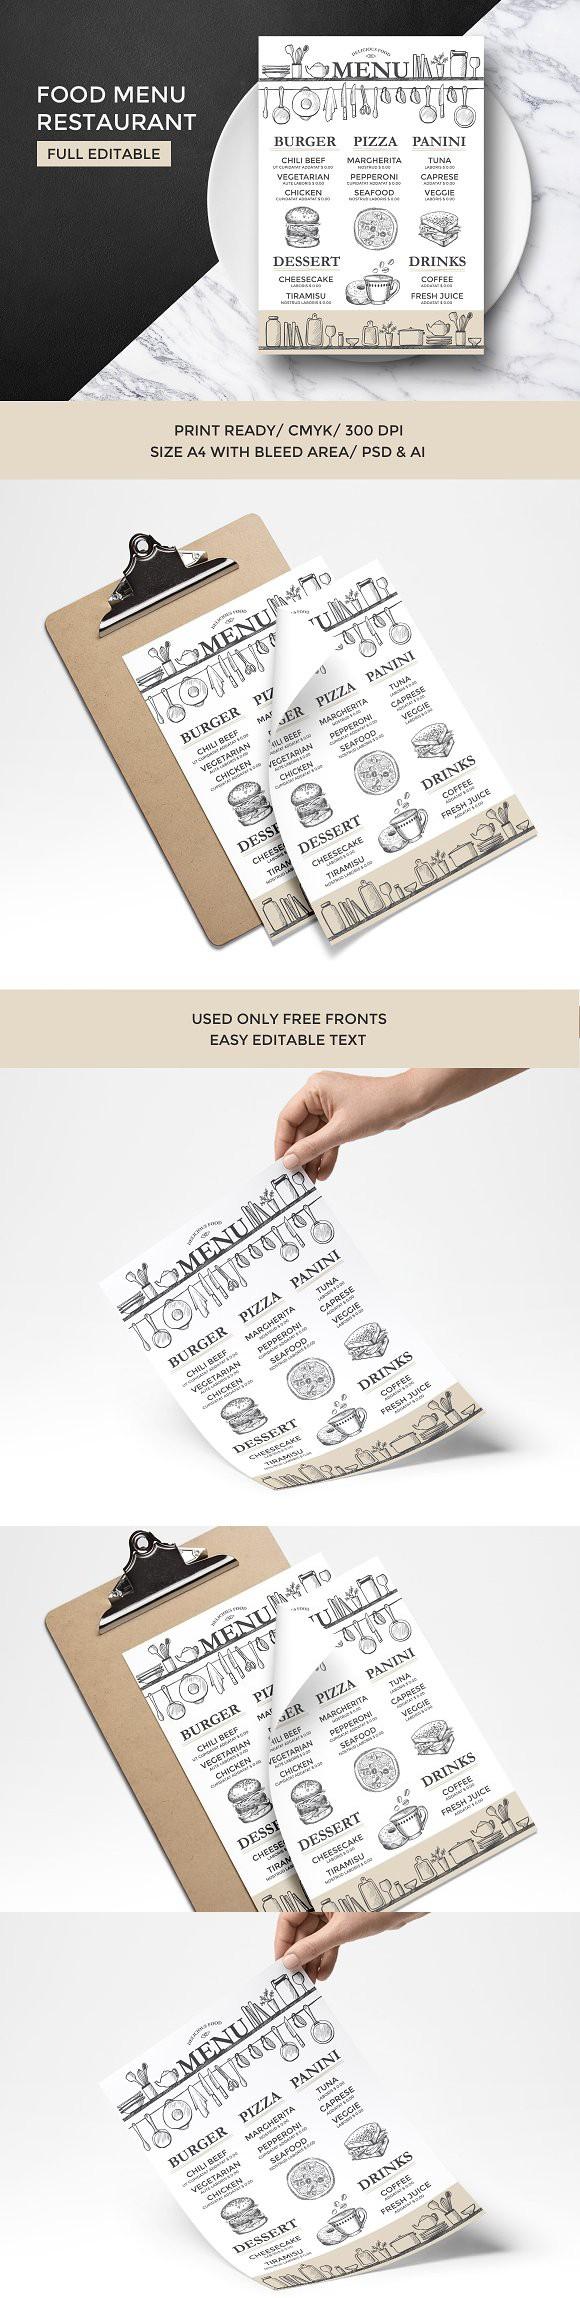 Food menu restaurant template. Brochure Templates